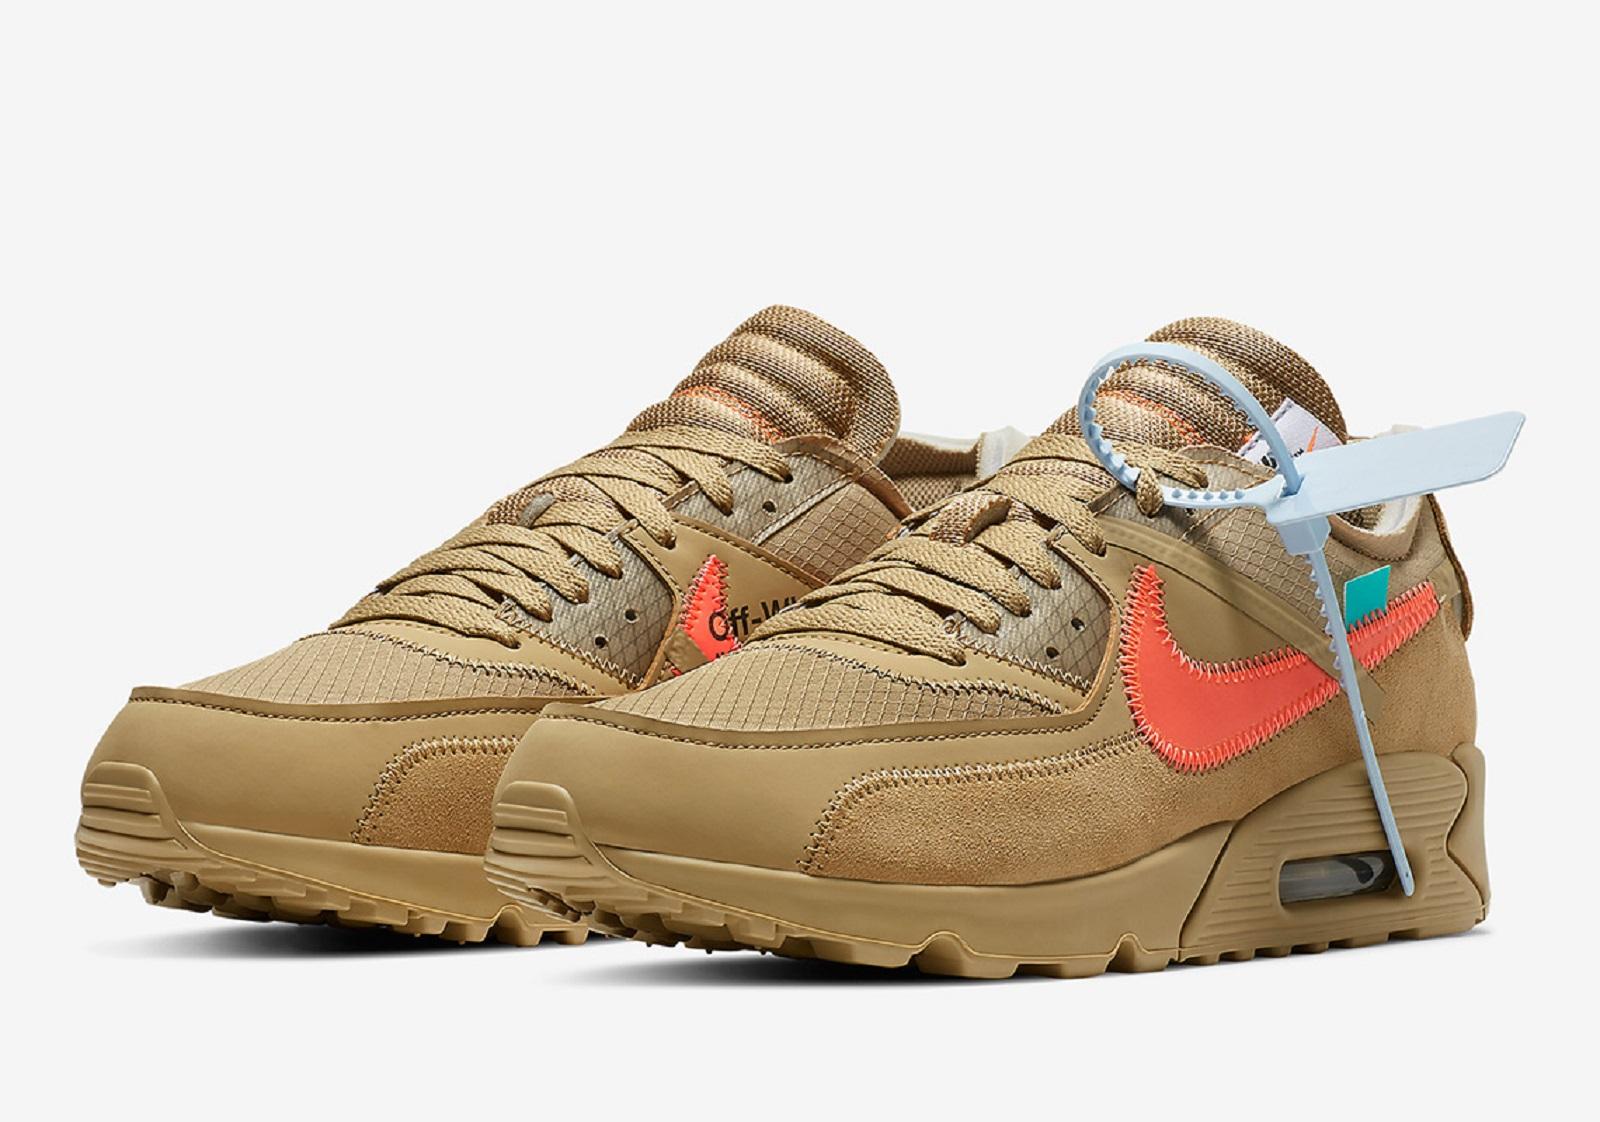 Nike Nike Air Max 90 Frühling Sommer Kollektion Sie